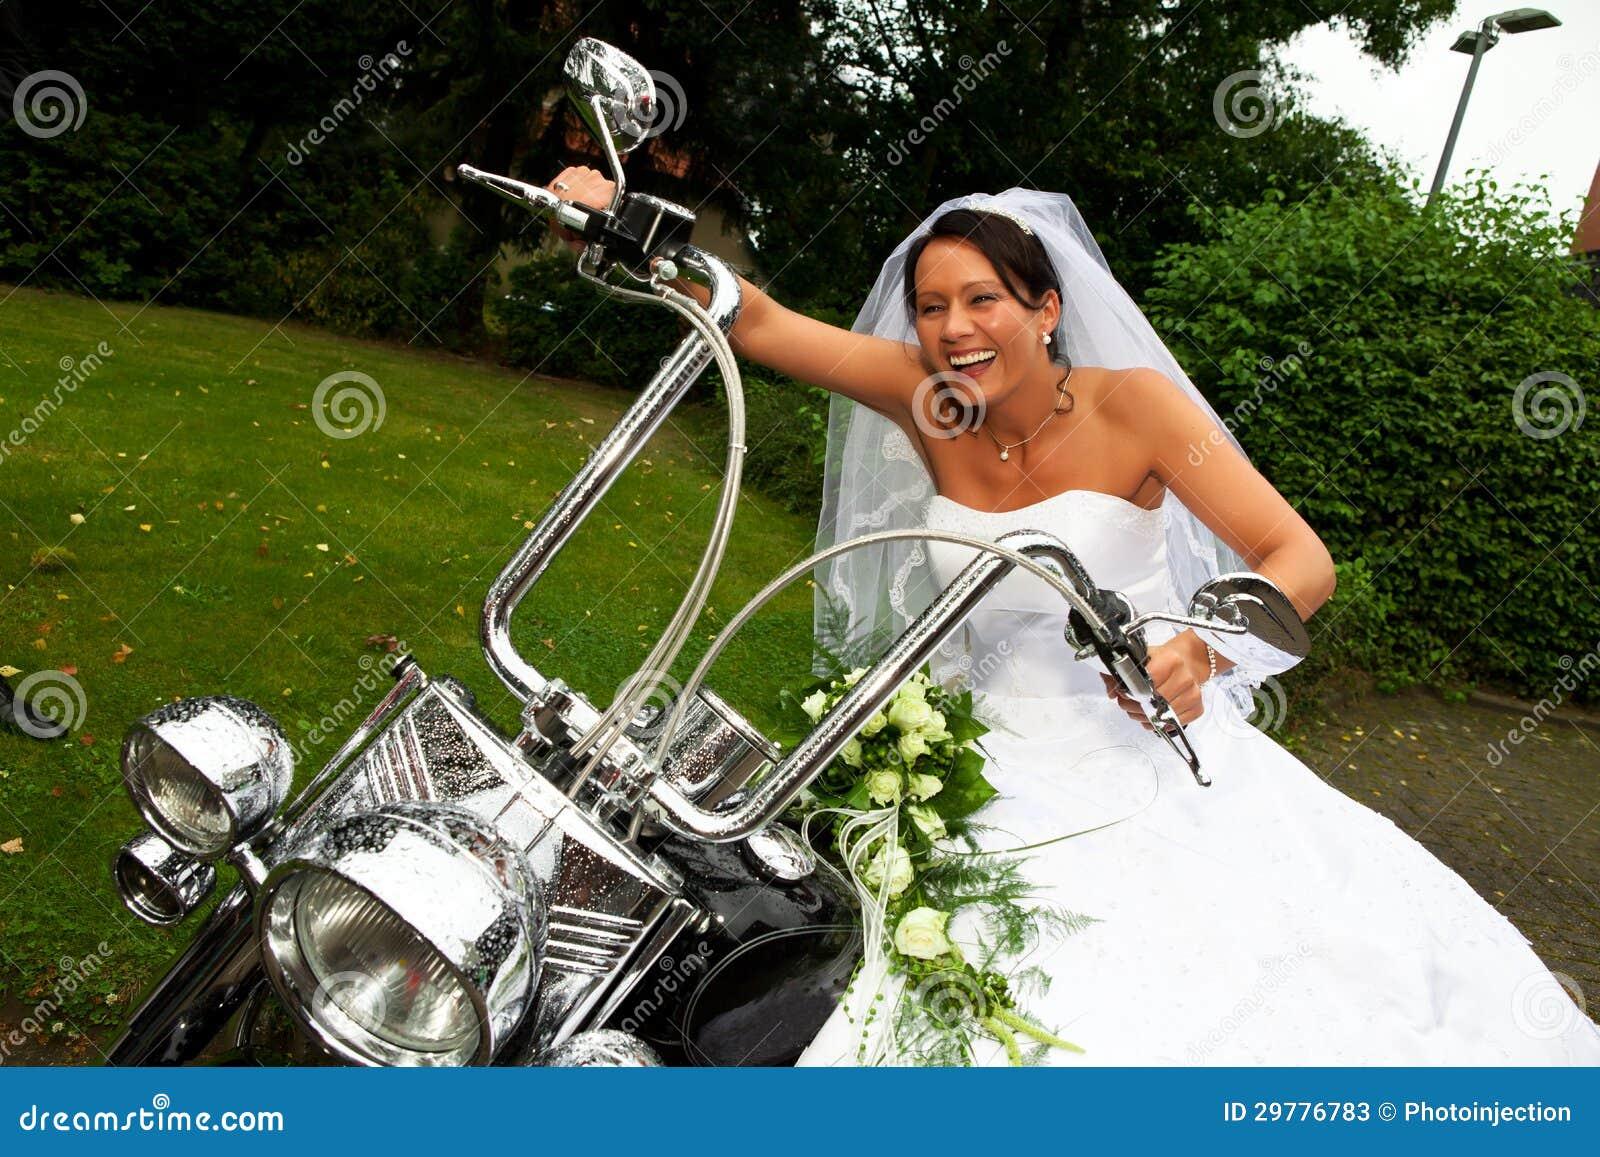 Harley Davidson Wedding: Bride On Harley Davidson Bike Stock Image